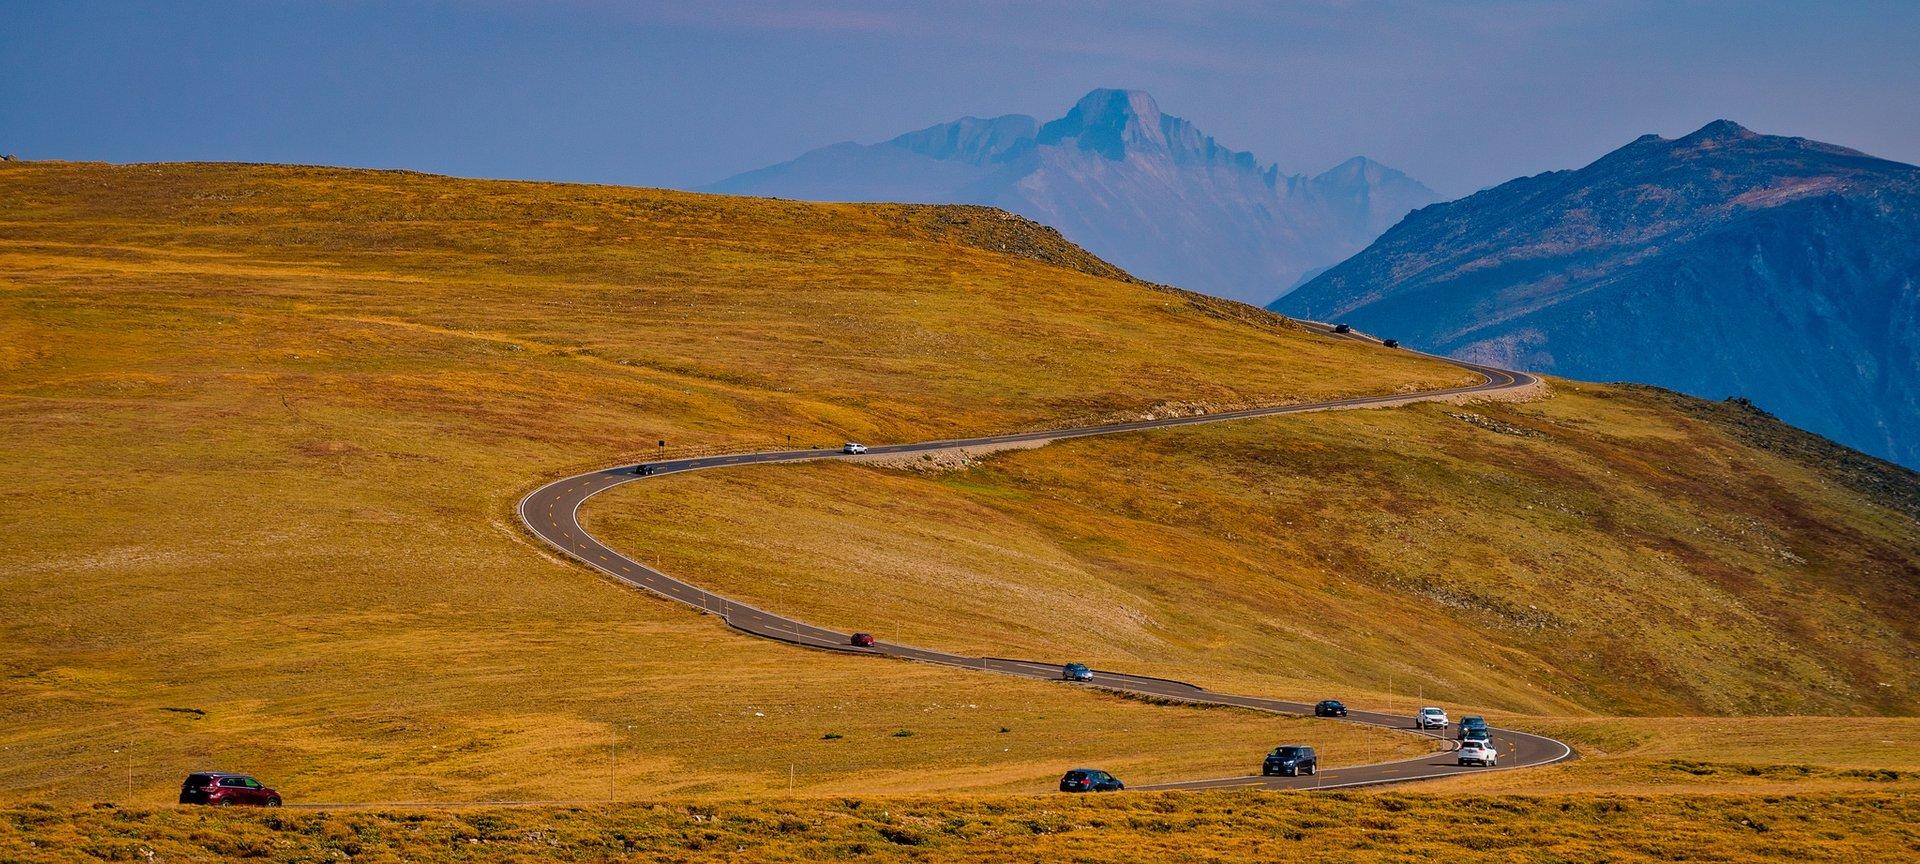 Trail Ridge Road in Colorado 2020 - Best Time